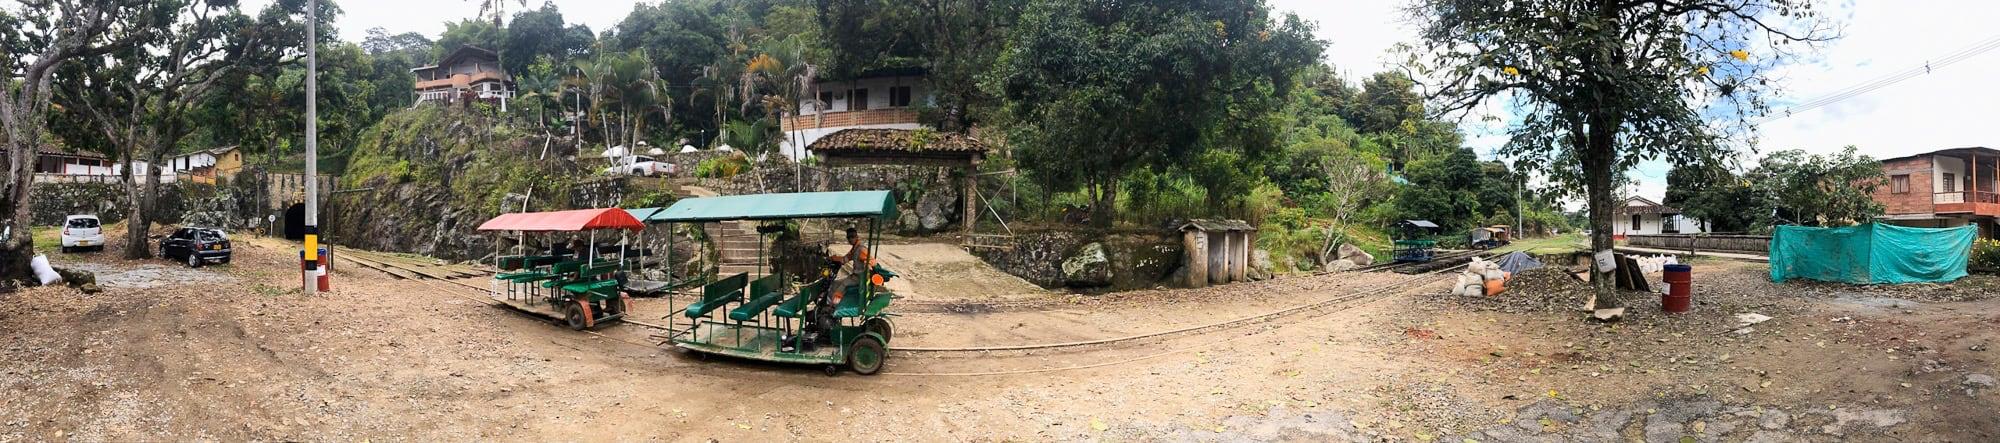 Antioquia Railroad between Medellin and Puerto Berrio at the entrance of the La Quiebra Tunel